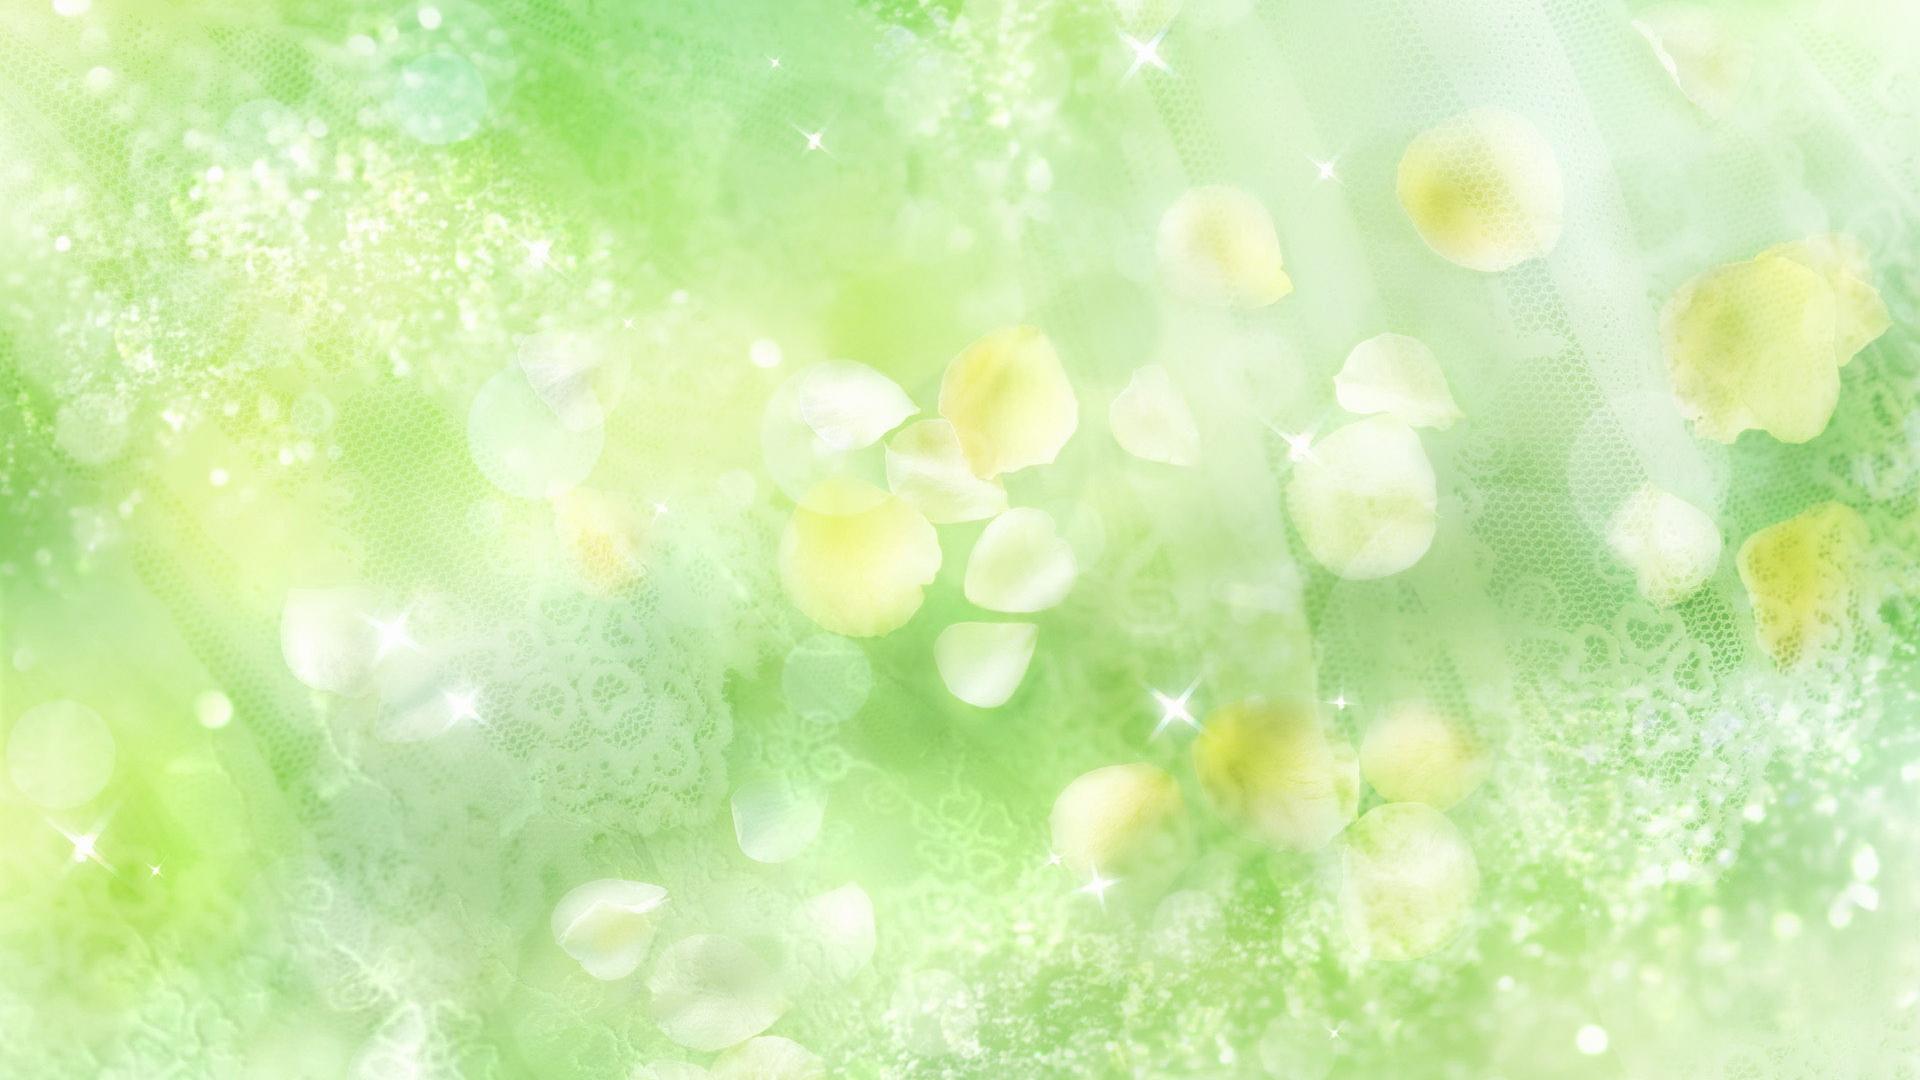 http://fs2.directupload.net/images/150705/74jg62tc.jpg